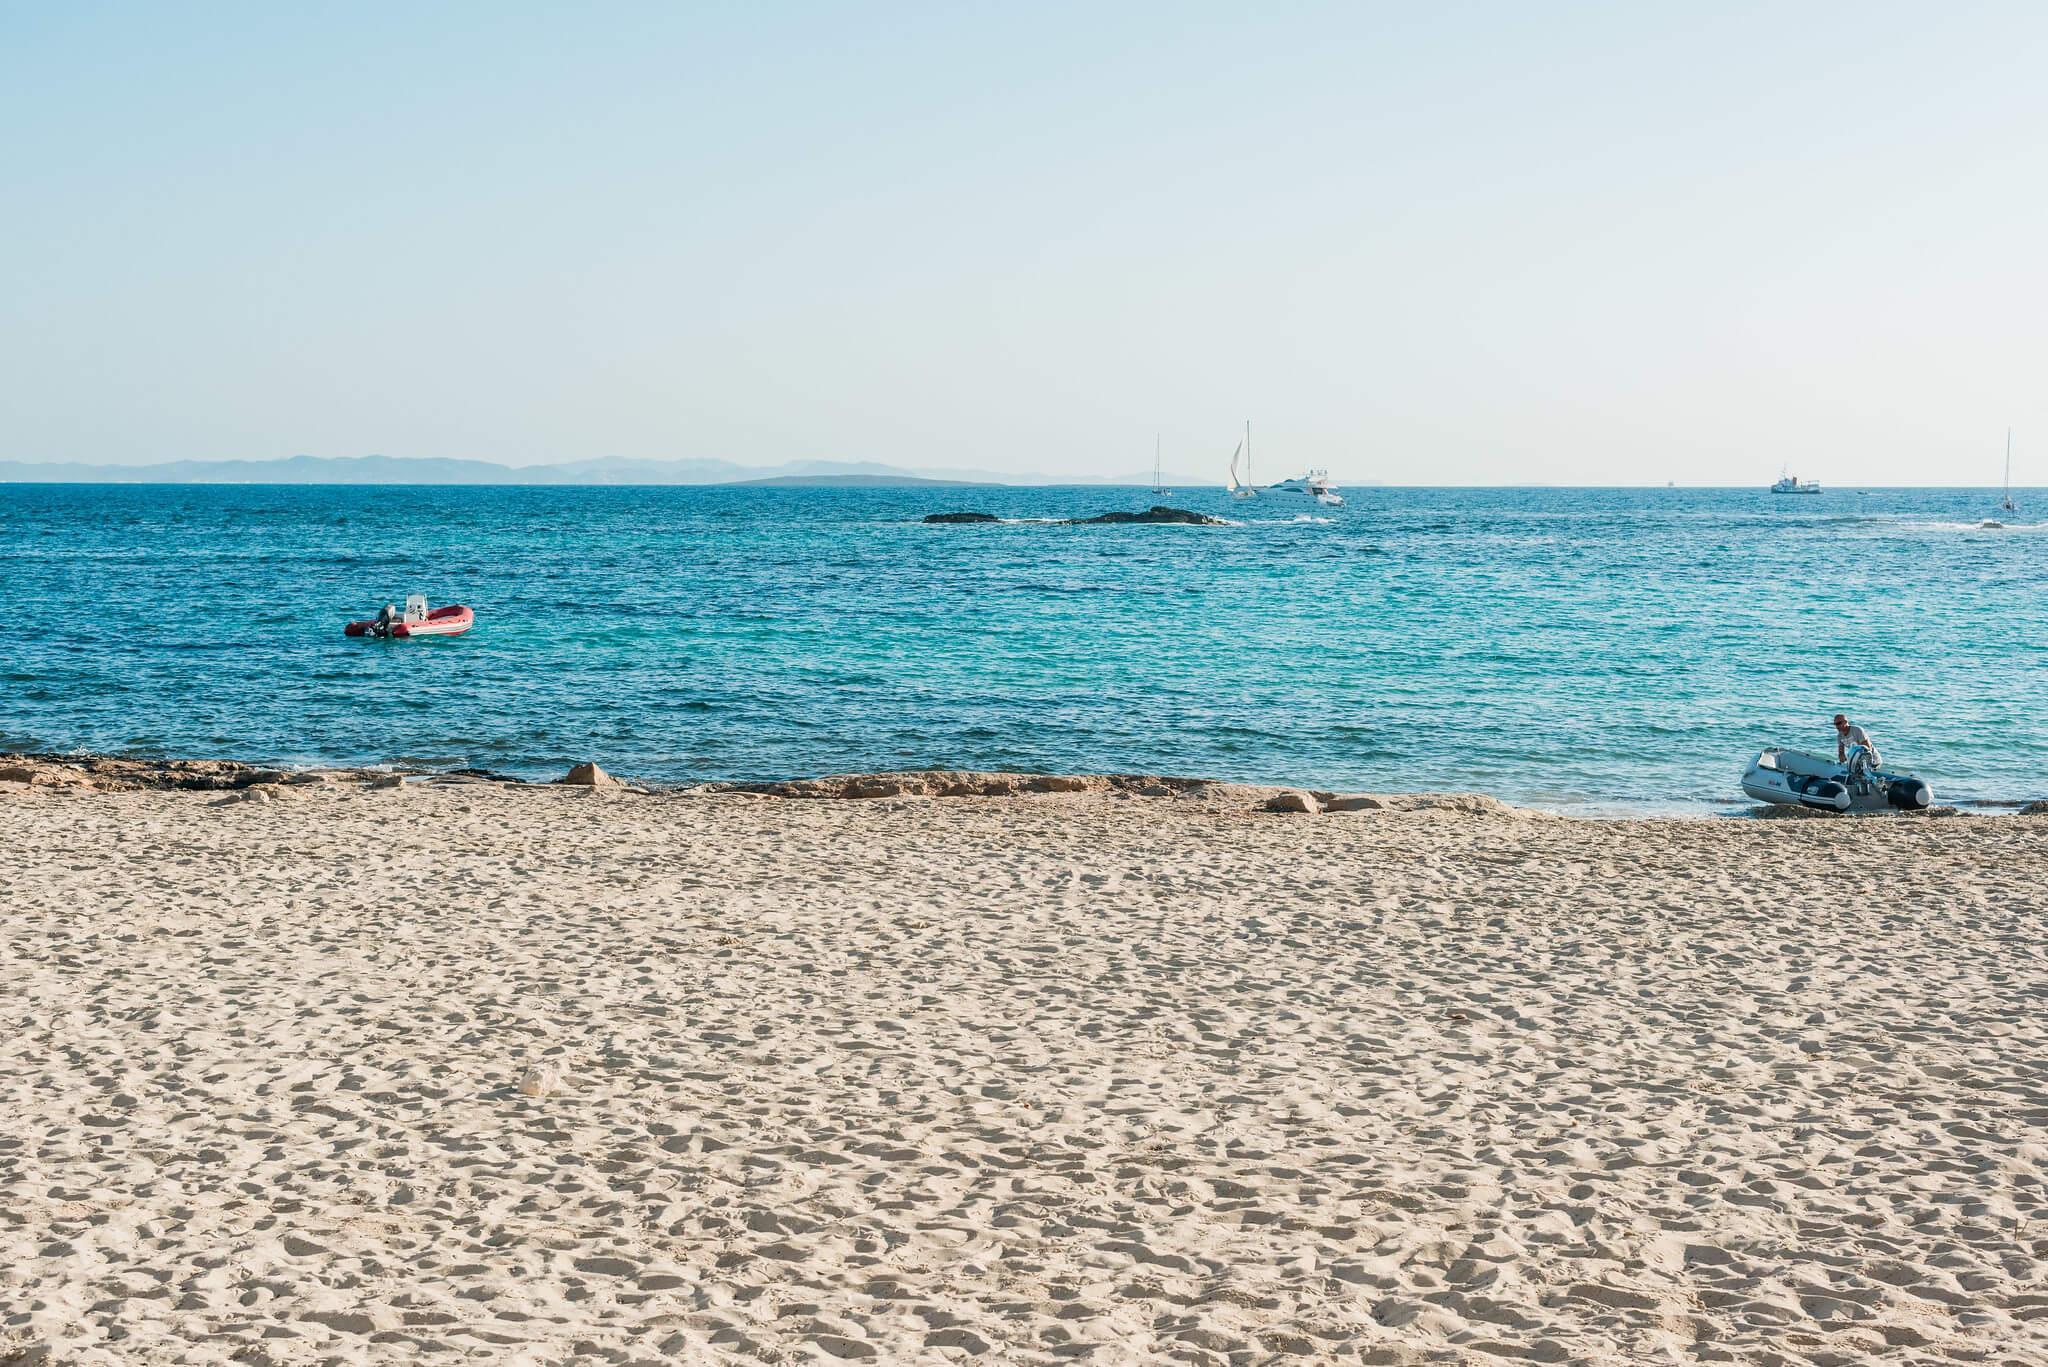 https://www.white-ibiza.com/wp-content/uploads/2020/03/formentera-beaches-es-pujols-2020-05.jpg